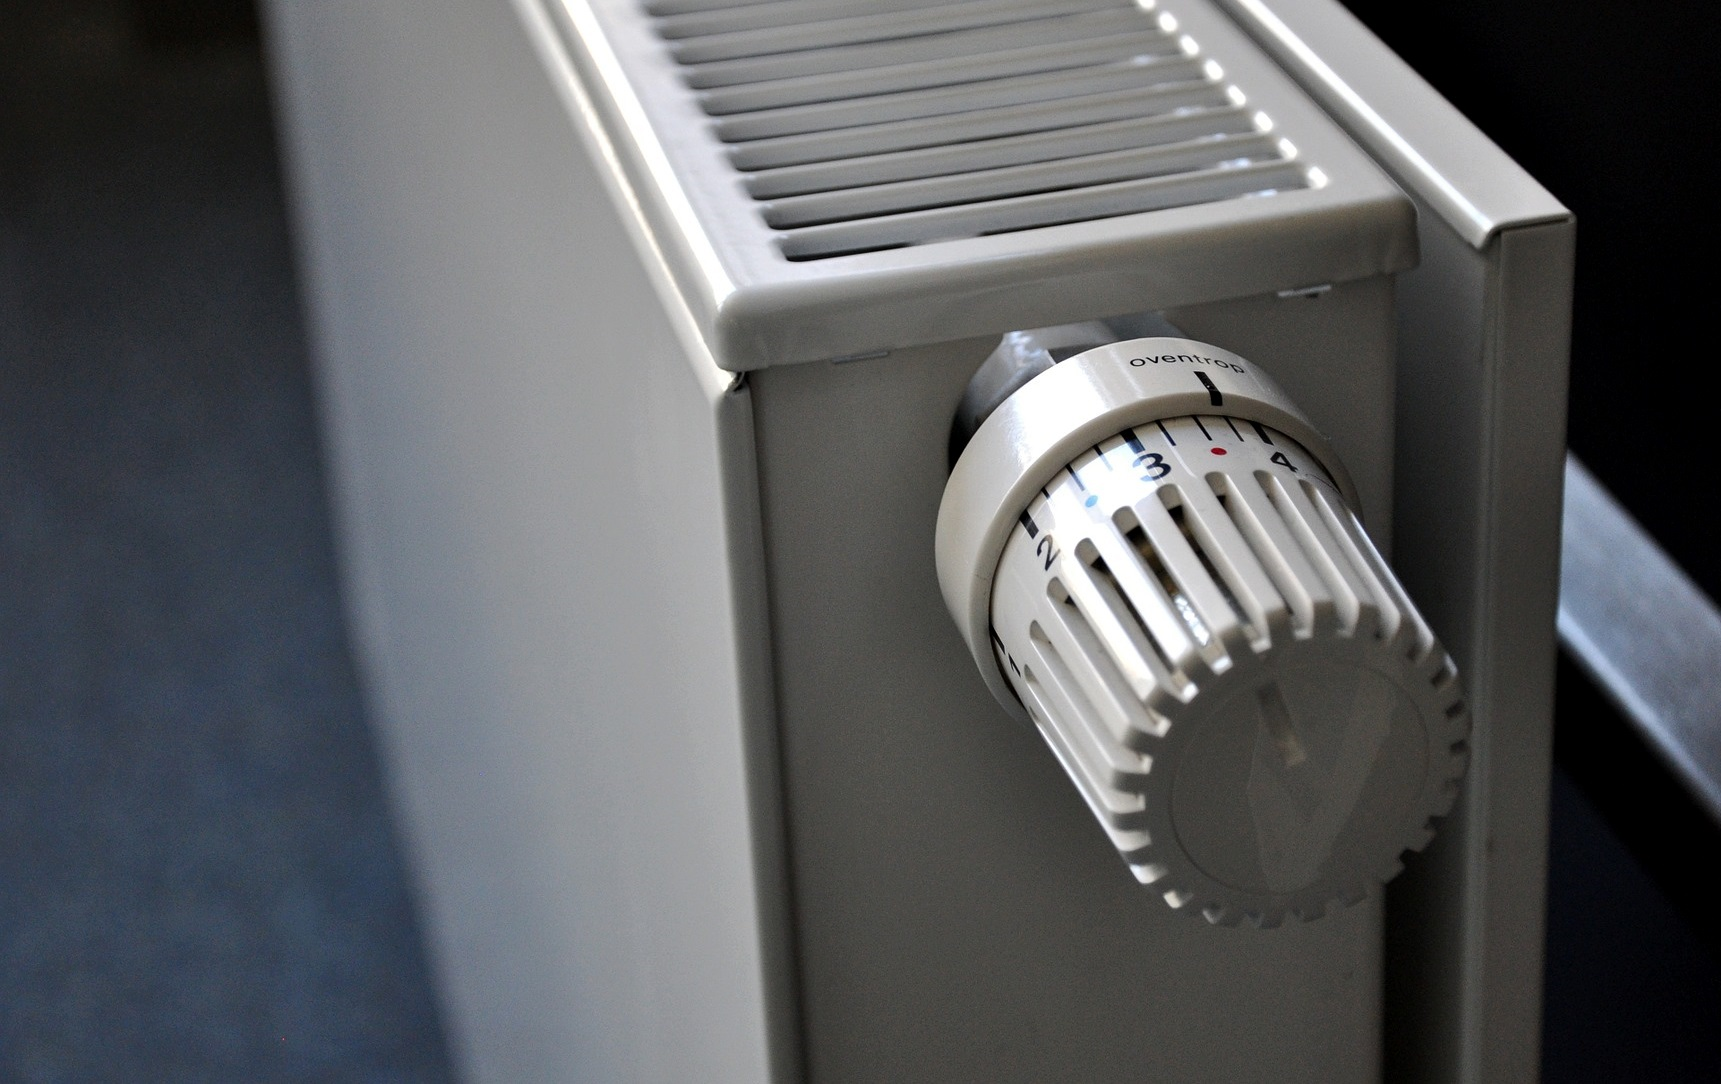 Schimmelpilzbefall vorbeugen Tipps Tricks Bautrocknung Duregger Bautrockner mieten München Miete Heizen Lüften Neubautrocknung Feuchtigkeit Luftentfeuchter Heizung